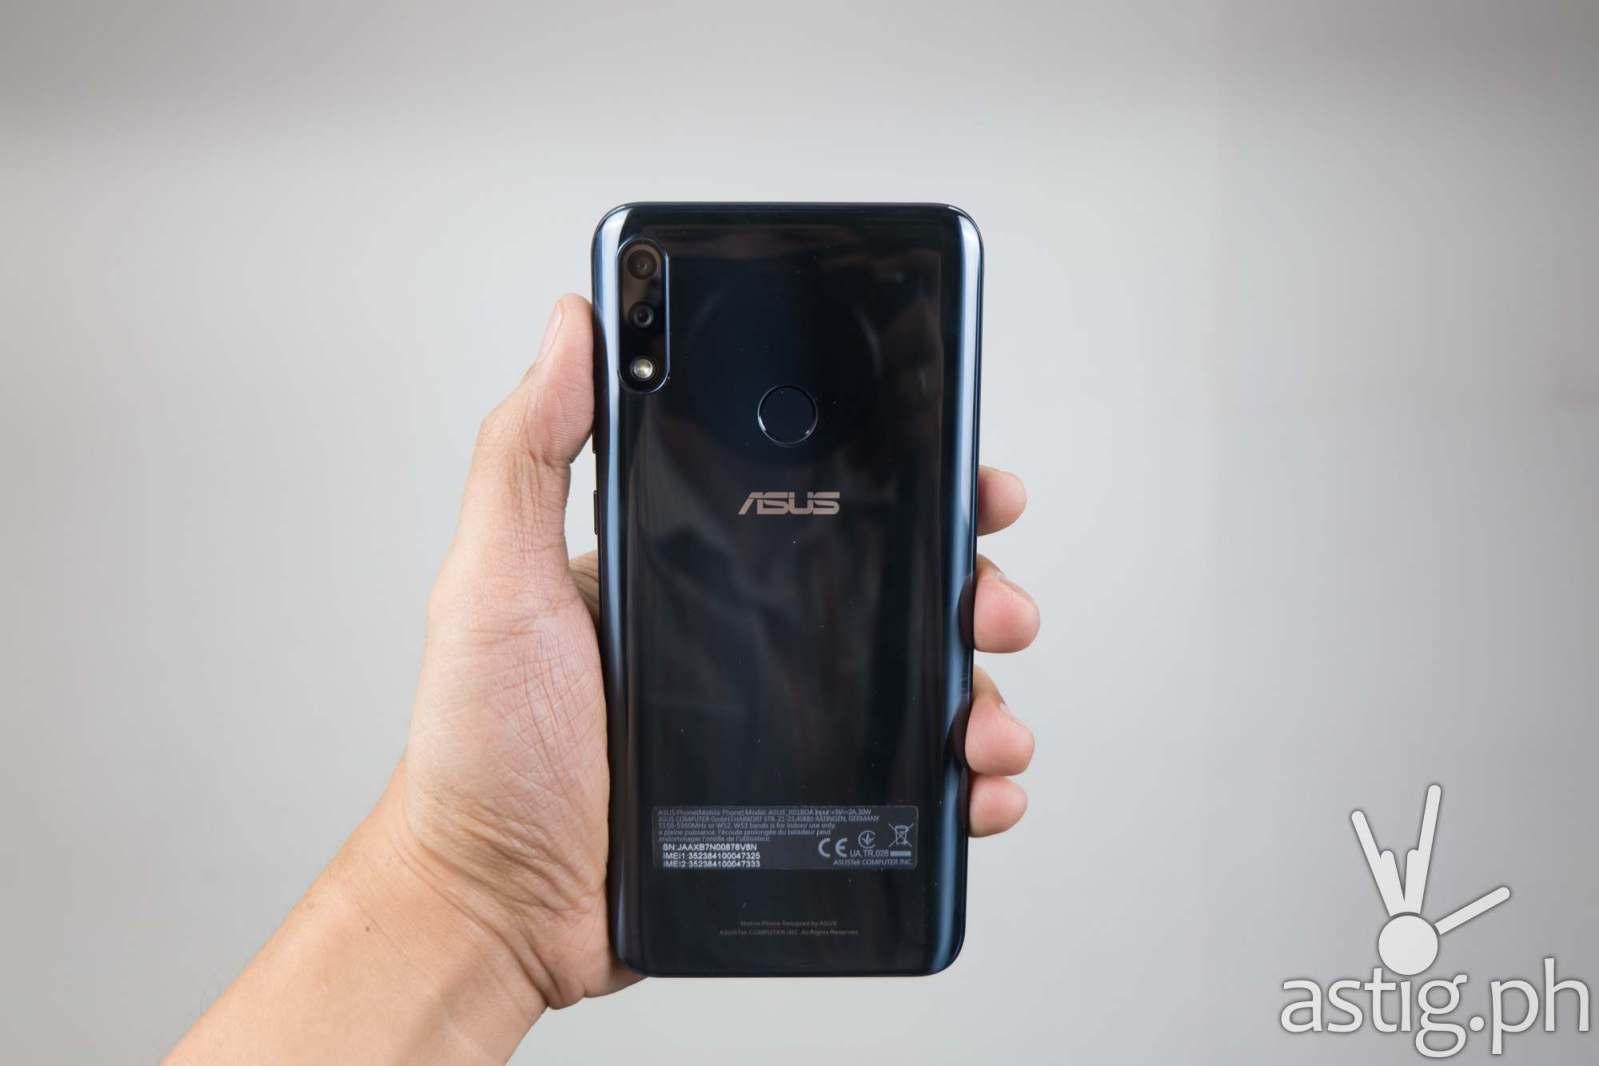 ASUS ZenFone Max Pro M2 (Philippines) back handheld